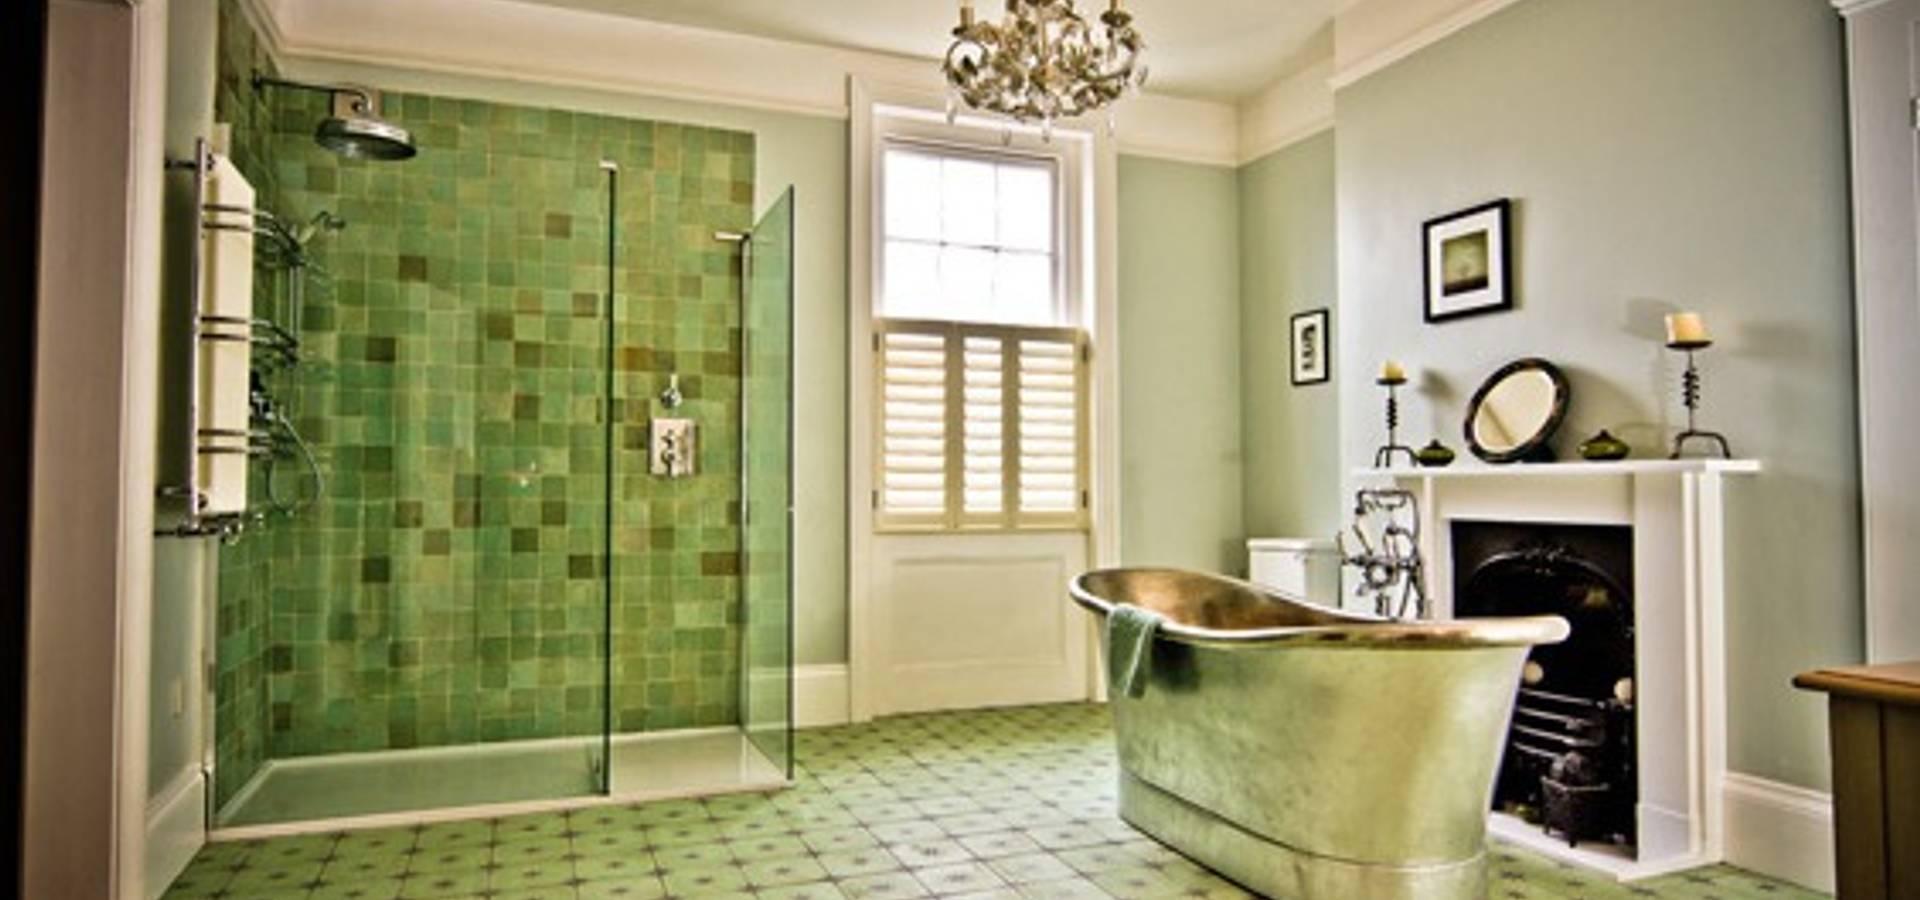 Parker bathrooms & Kitchens